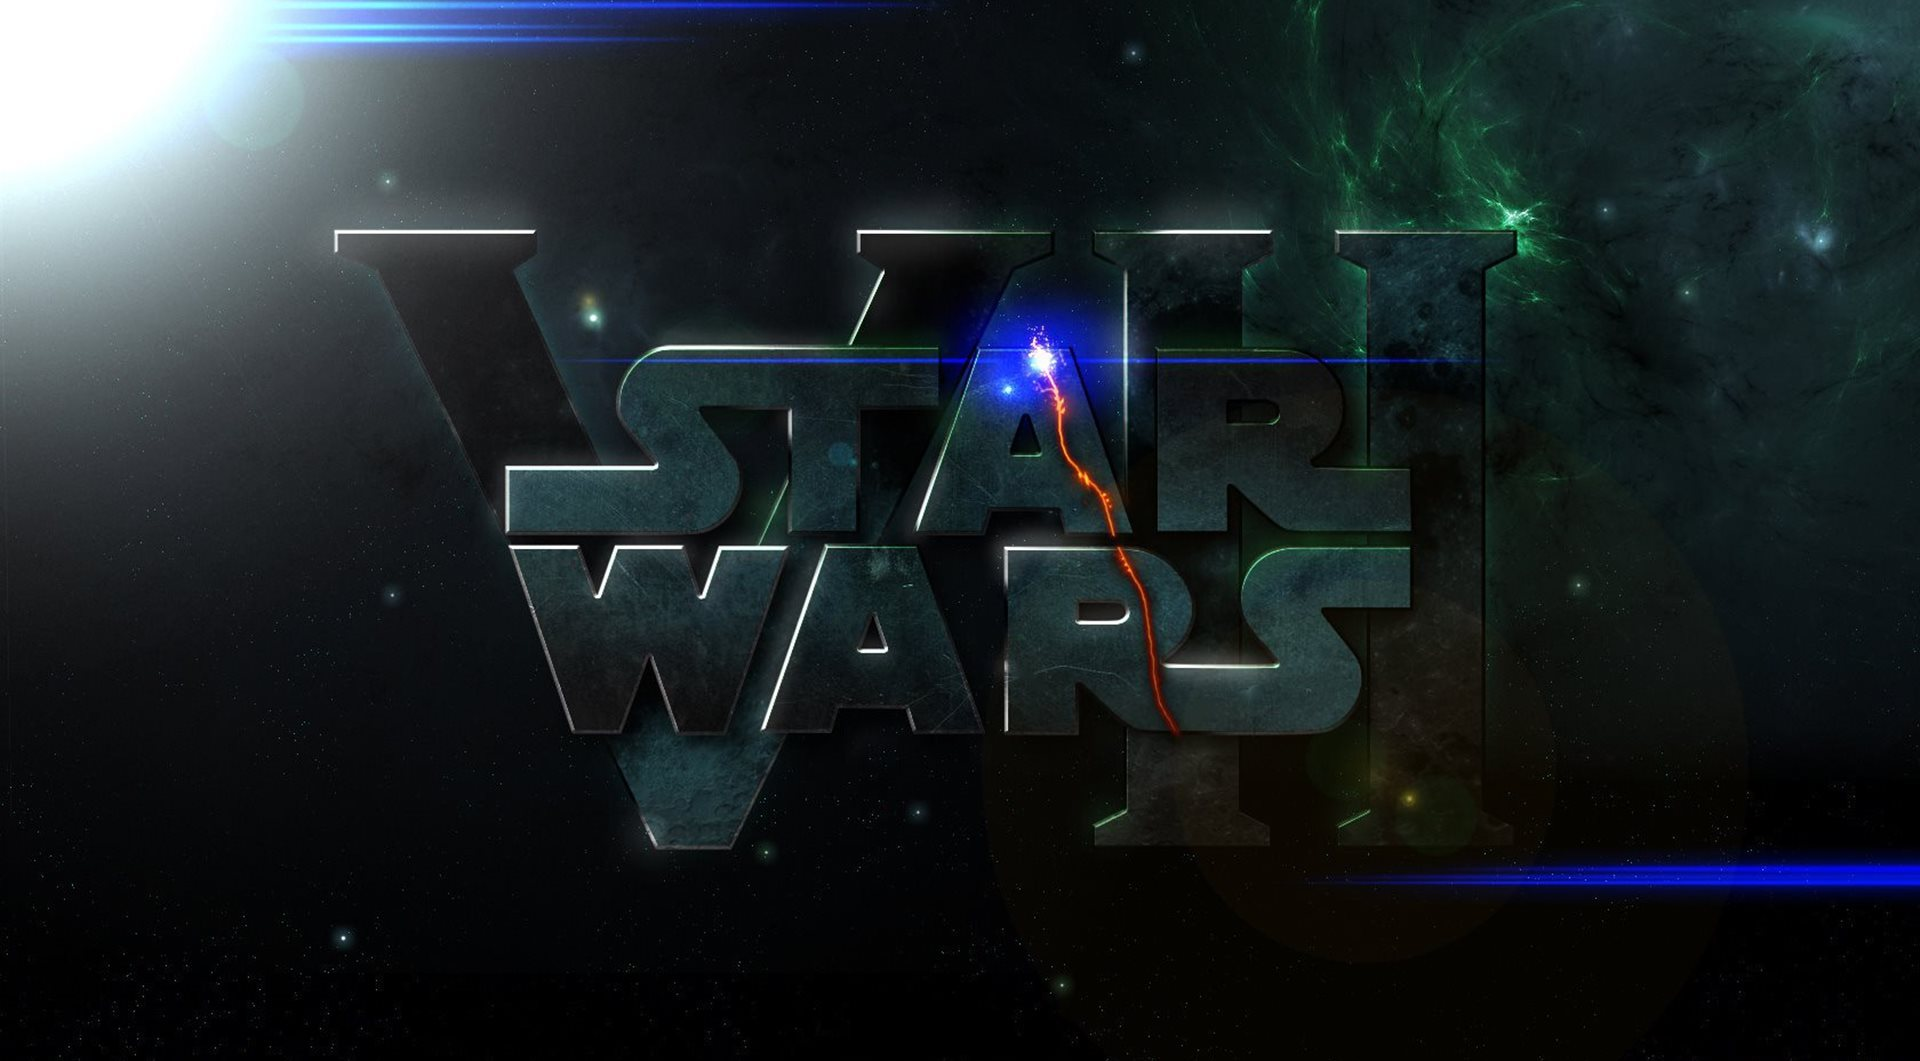 48 New Star Wars Wallpaper 2015 On Wallpapersafari